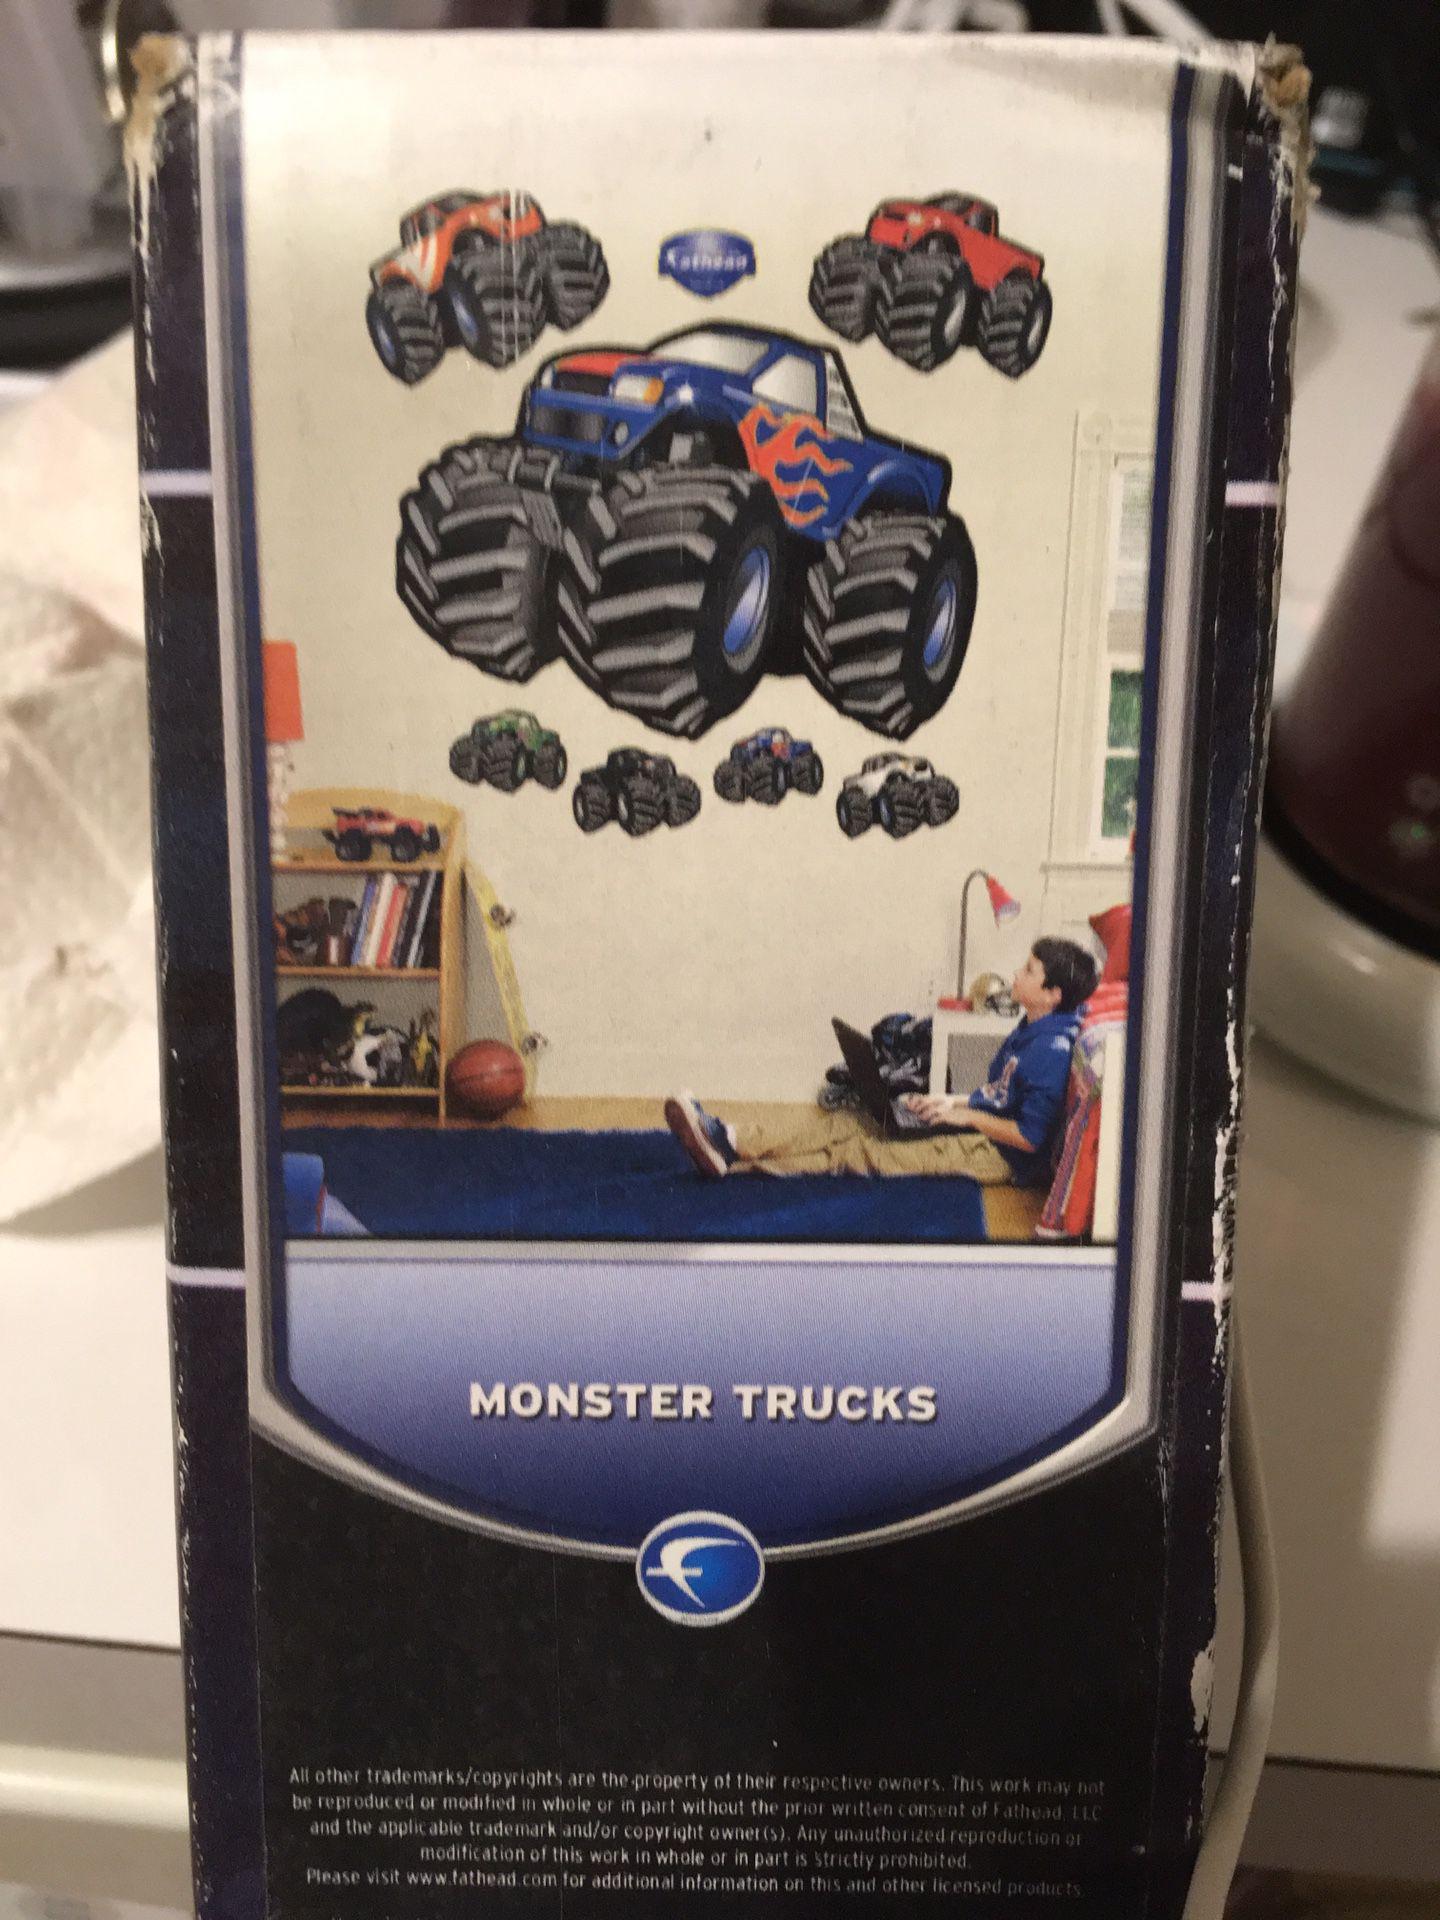 Monster Trucks-Vinyl Graphic for Bedroom walls